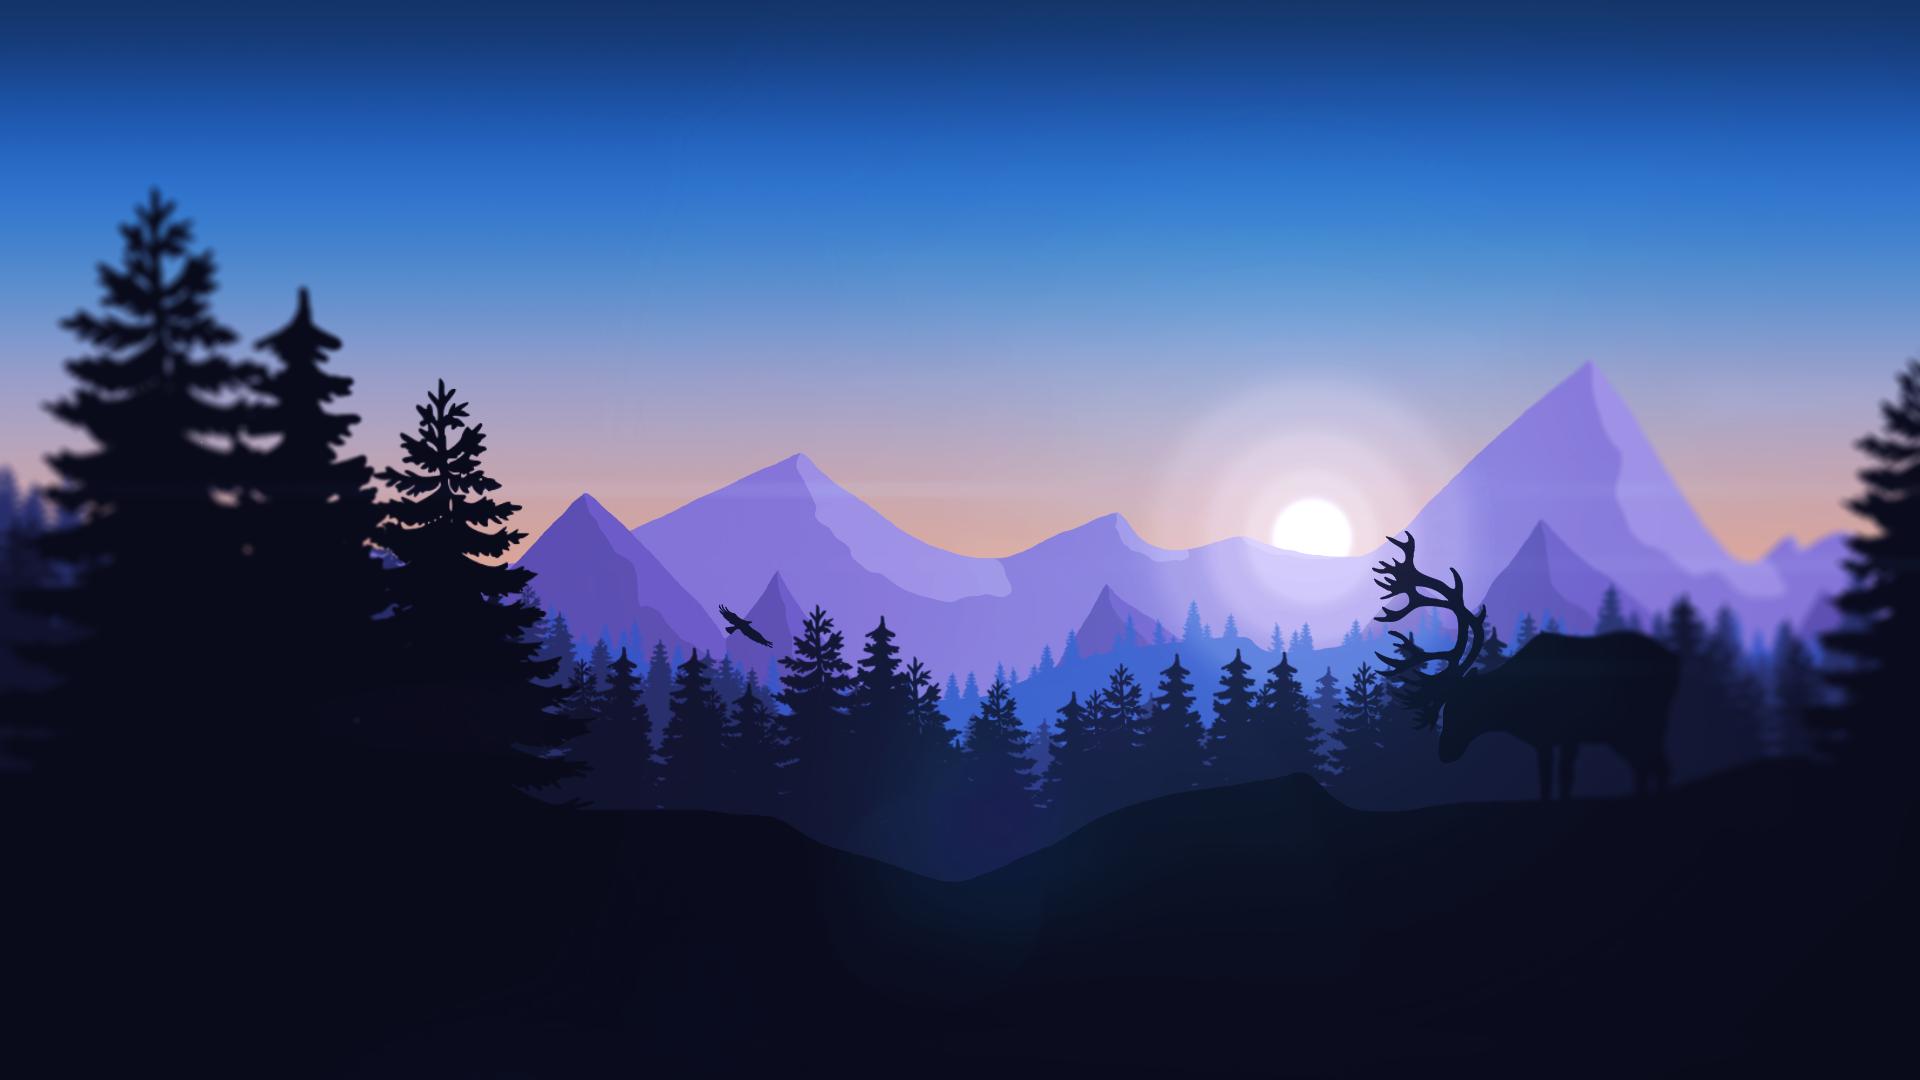 Great Wallpaper Mountain Minimalistic - forest-mountains-animals-minimalism-sunrise-atmosphere-Firewatch-dusk-mountain-dawn-screenshot-atmospheric-phenomenon-computer-wallpaper-mountainous-landforms-ecosystem-mountain-range-56952  Gallery_518186.png